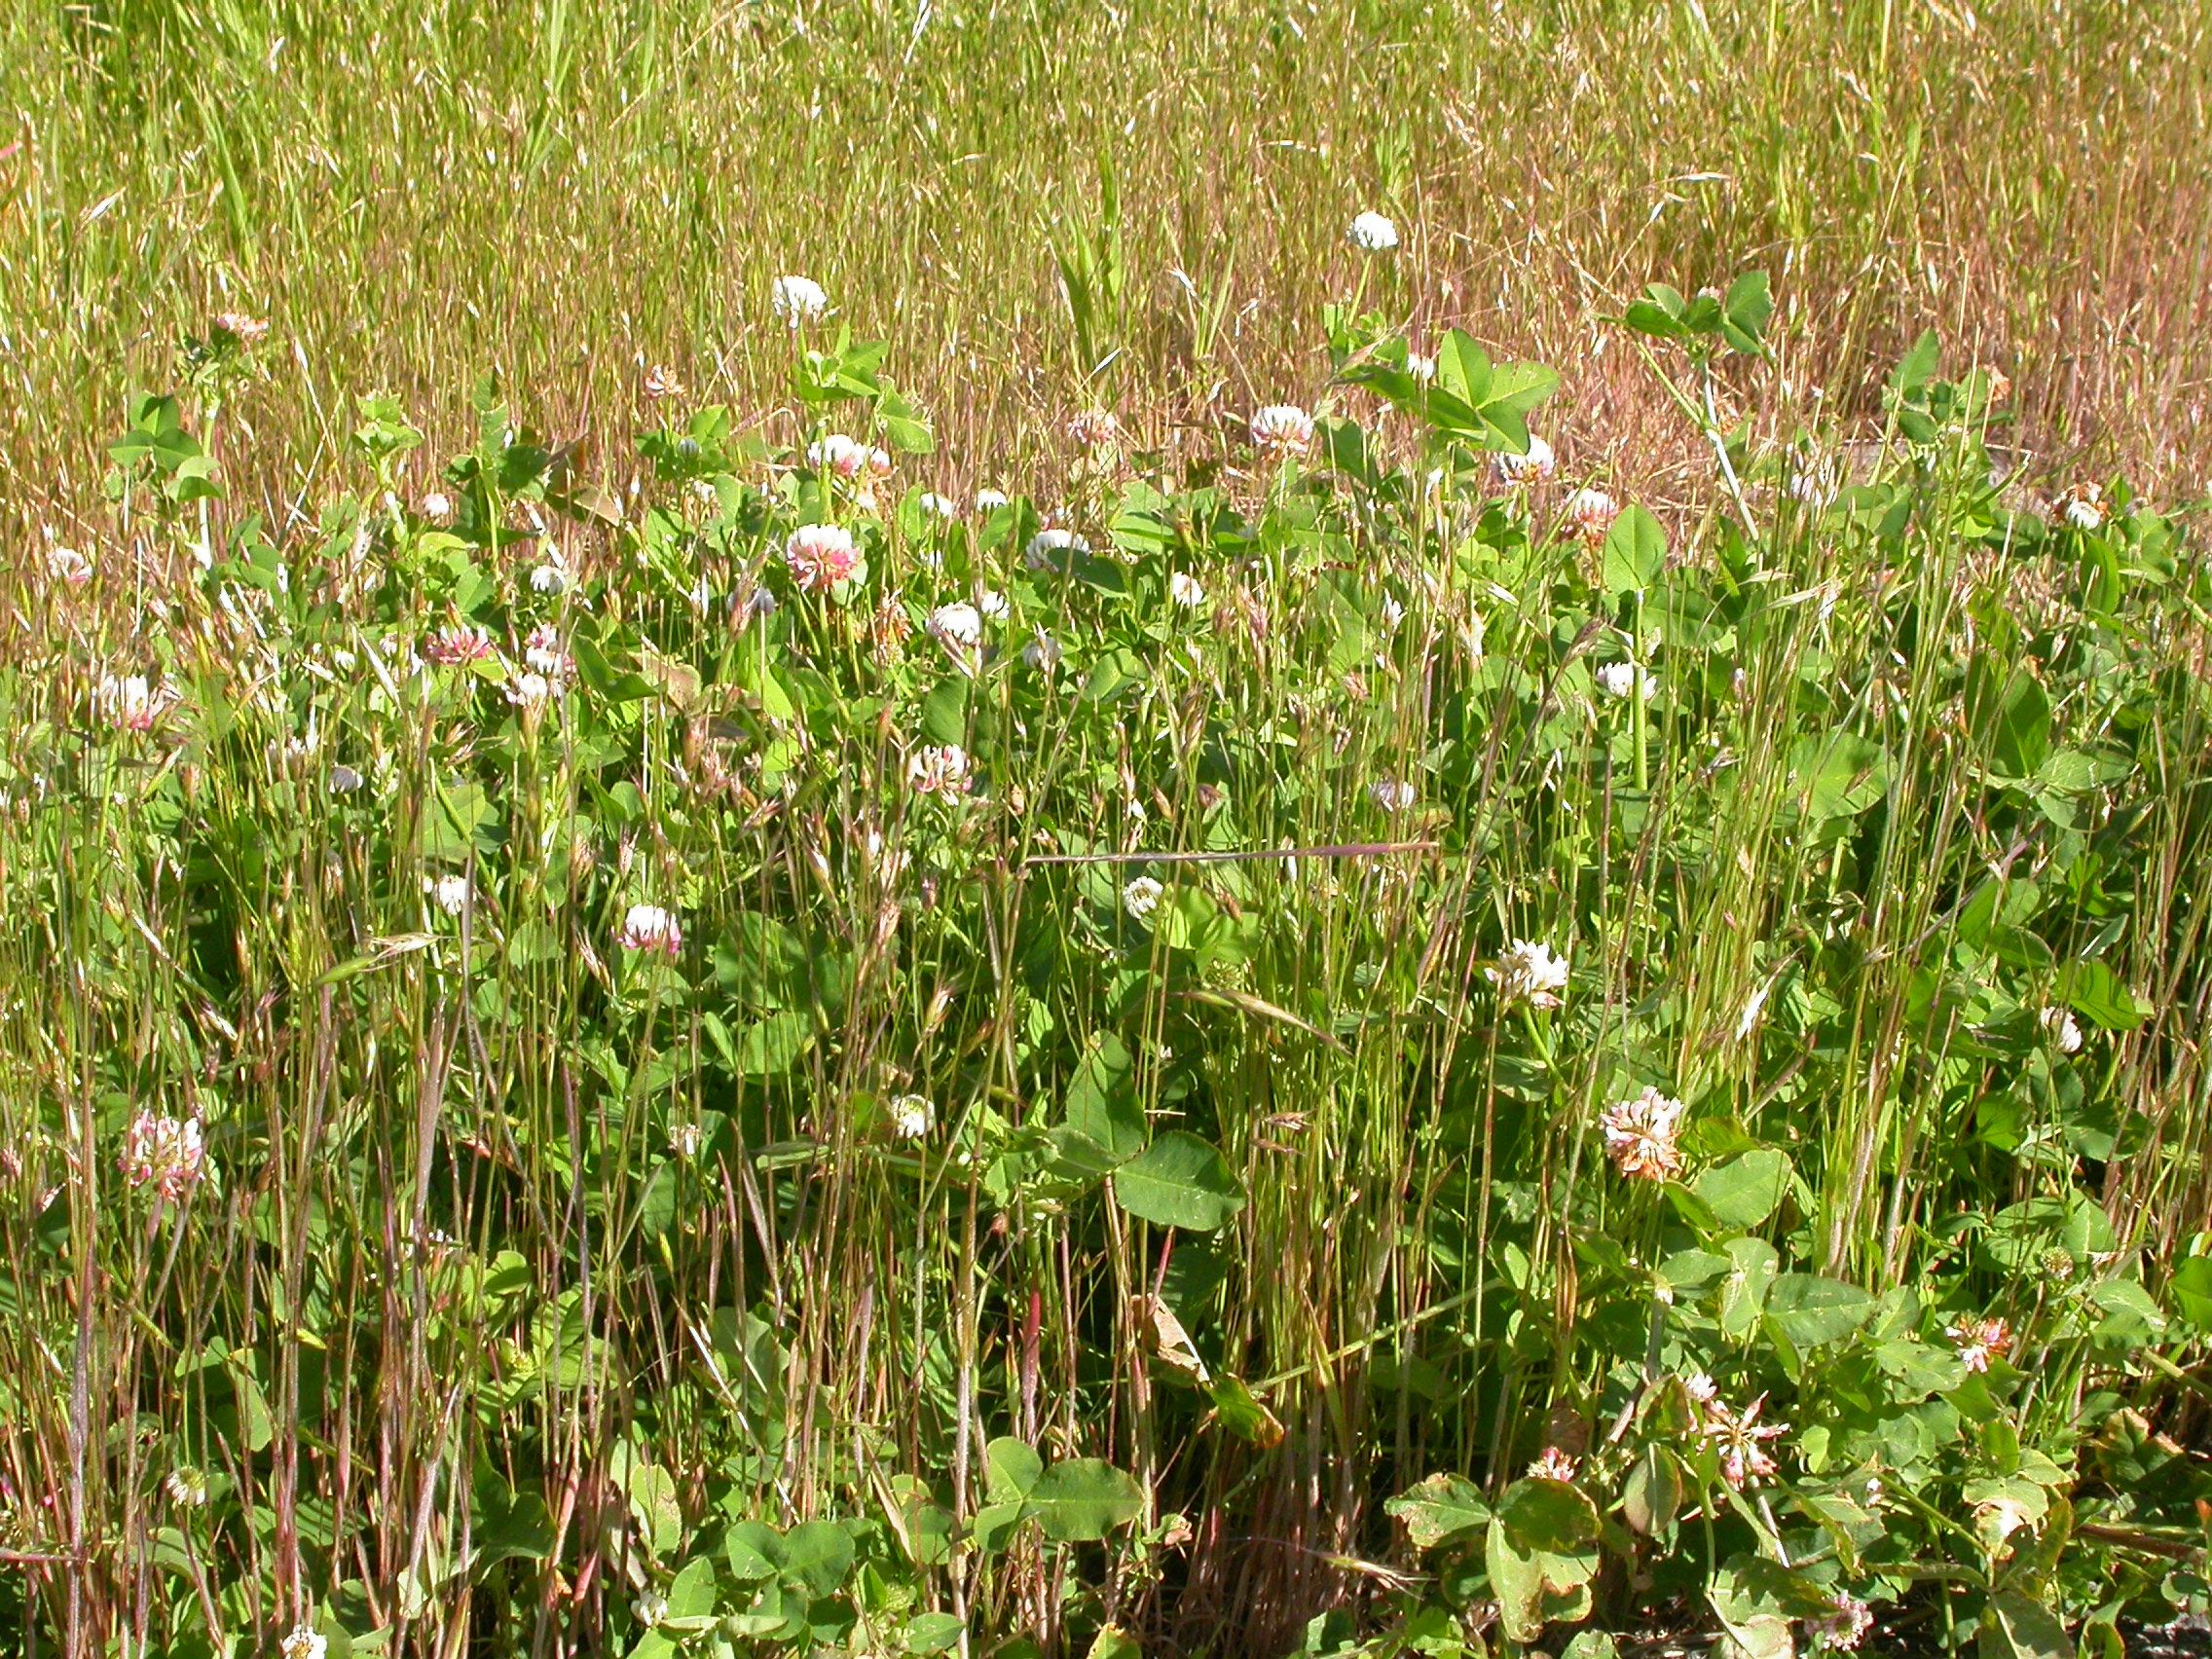 By Matt Lavin from Bozeman, Montana, USA (Trifolium hybridum  Uploaded by Tim1357) [CC BY-SA 2.0 (http://creativecommons.org/licenses/by-sa/2.0)], via Wikimedia Commons